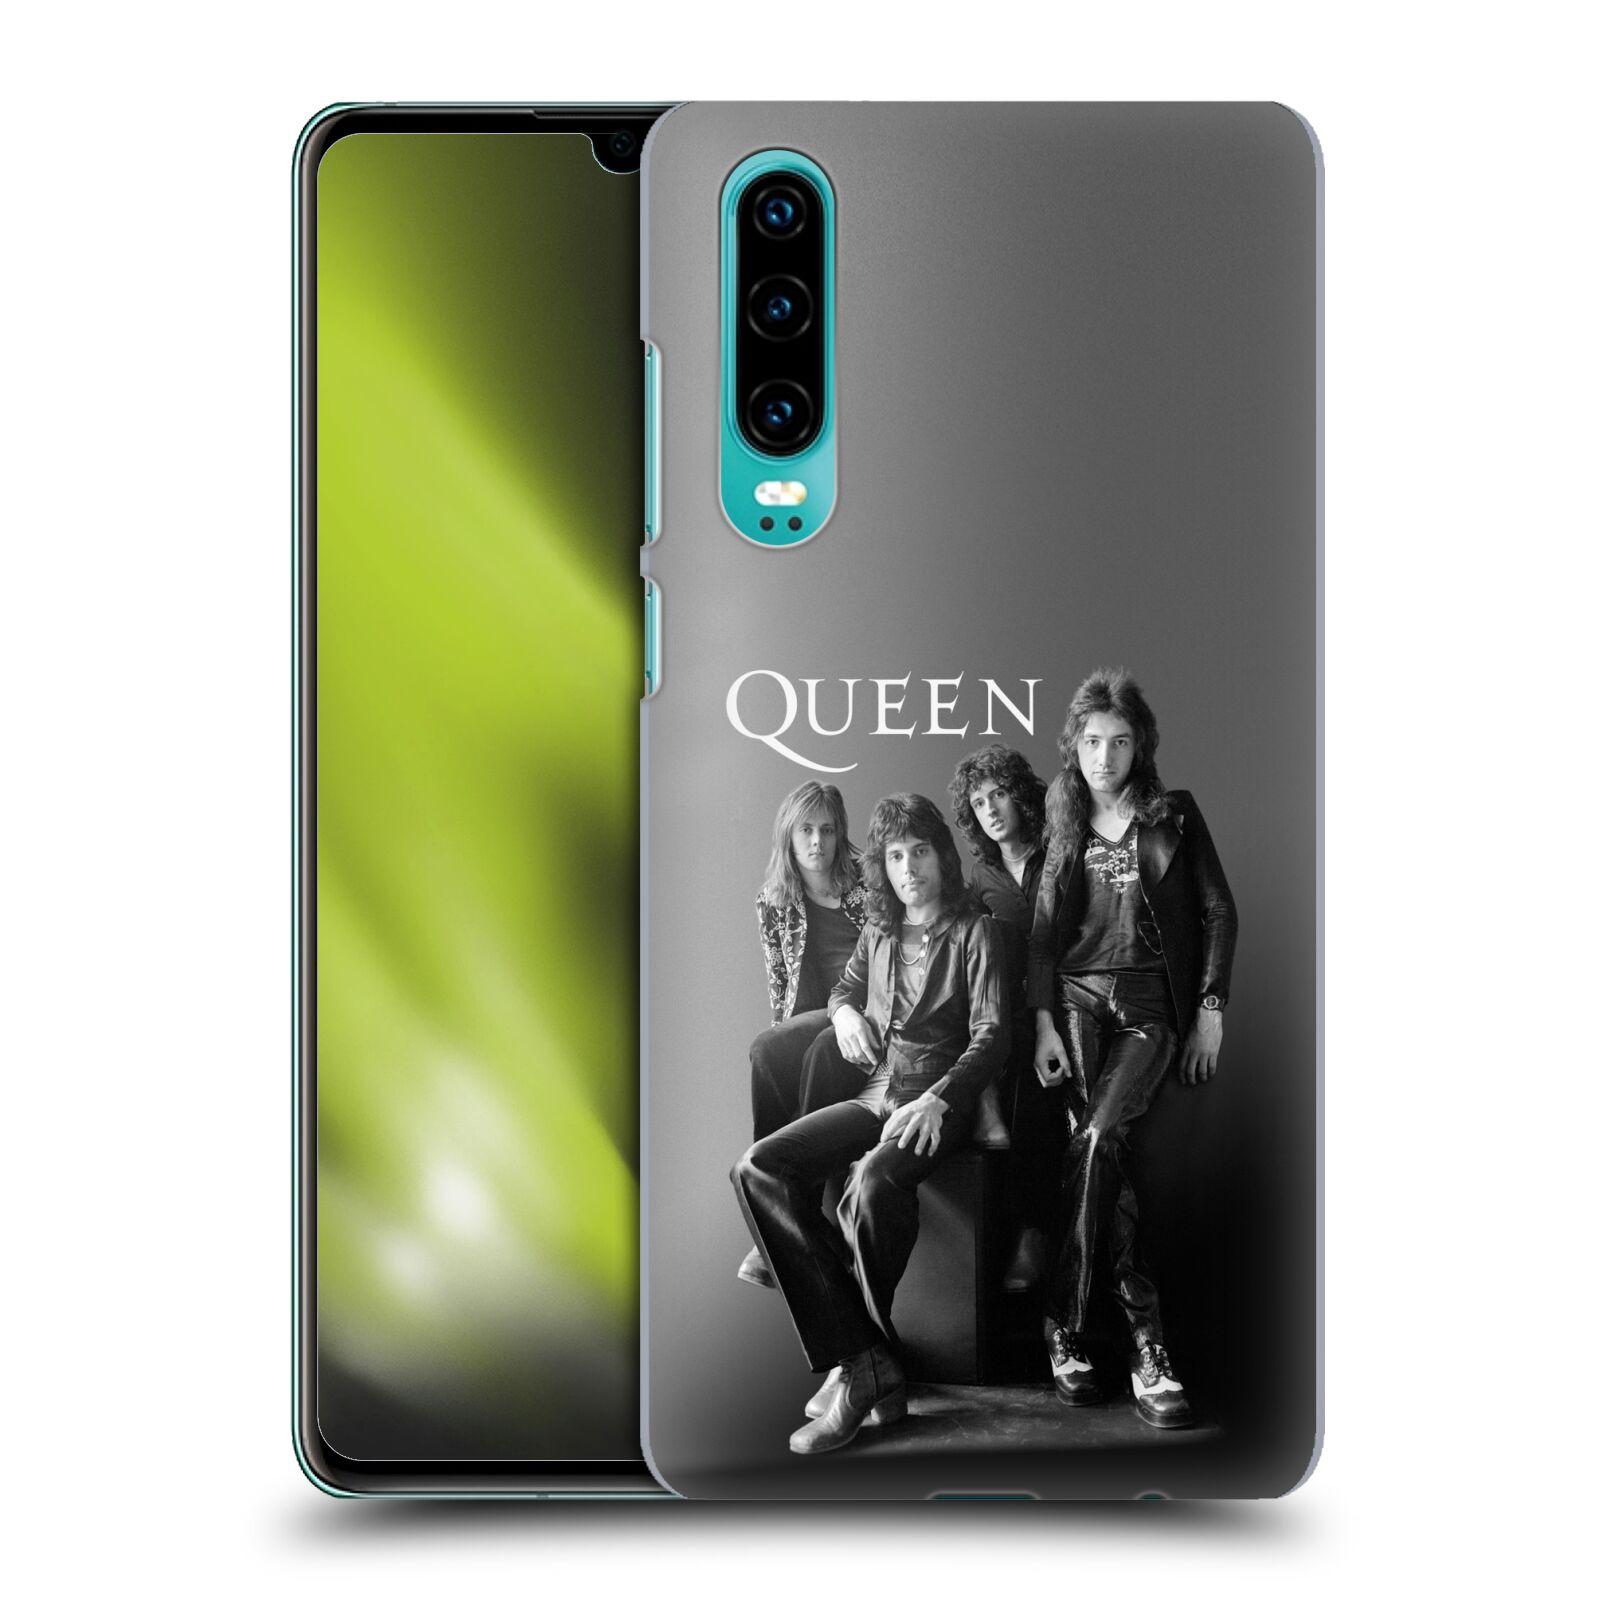 Plastové pouzdro na mobil Huawei P30 - Head Case - Queen - Skupina